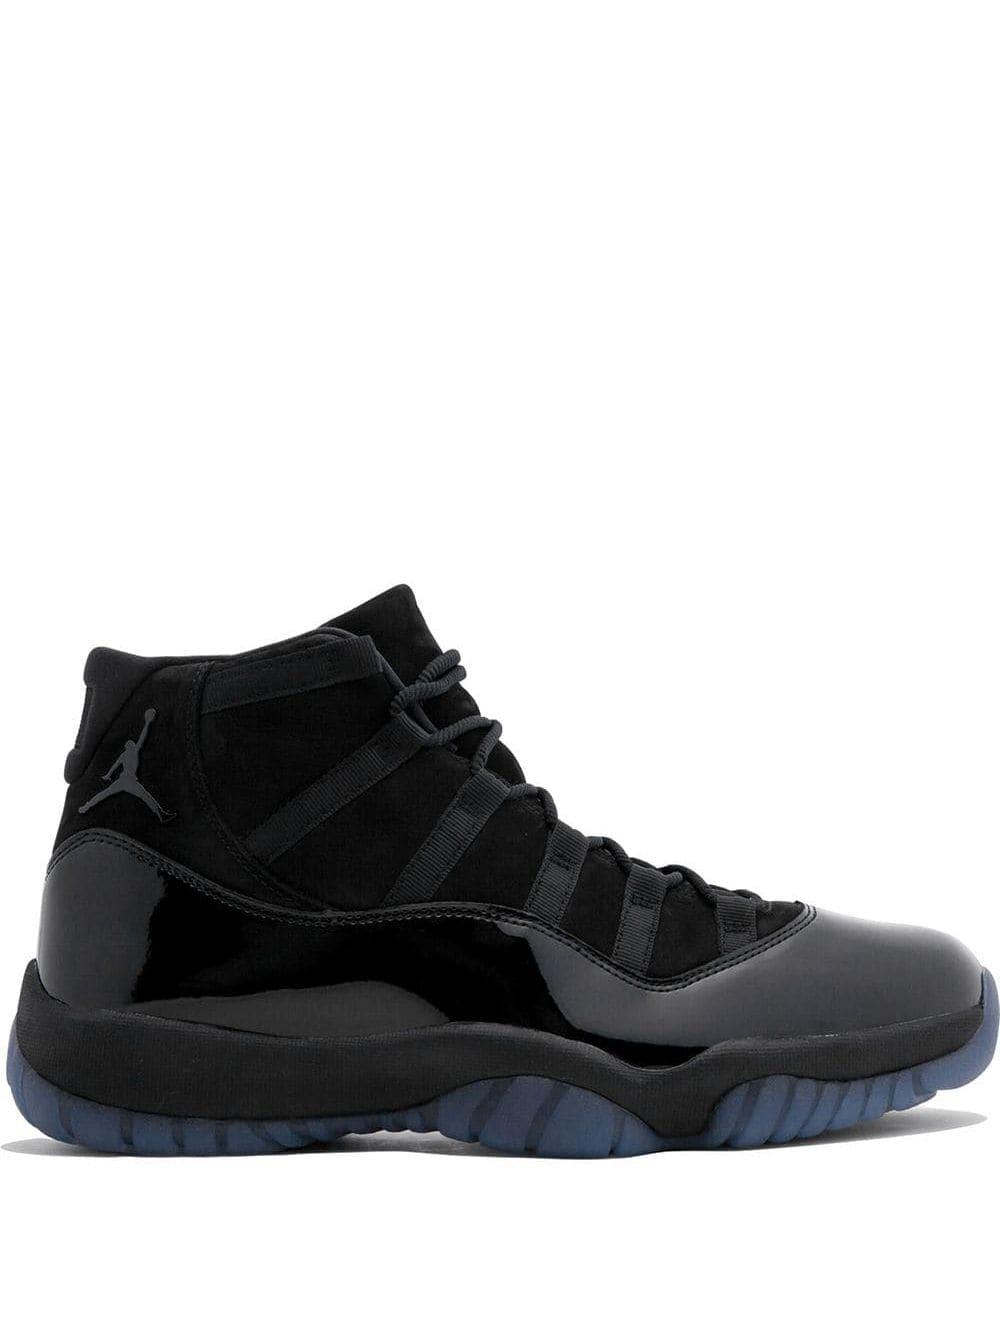 newest 0b86c 31a5f Jordan  Air Jordan 11 Retro  Sneakers - Schwarz von Jordan